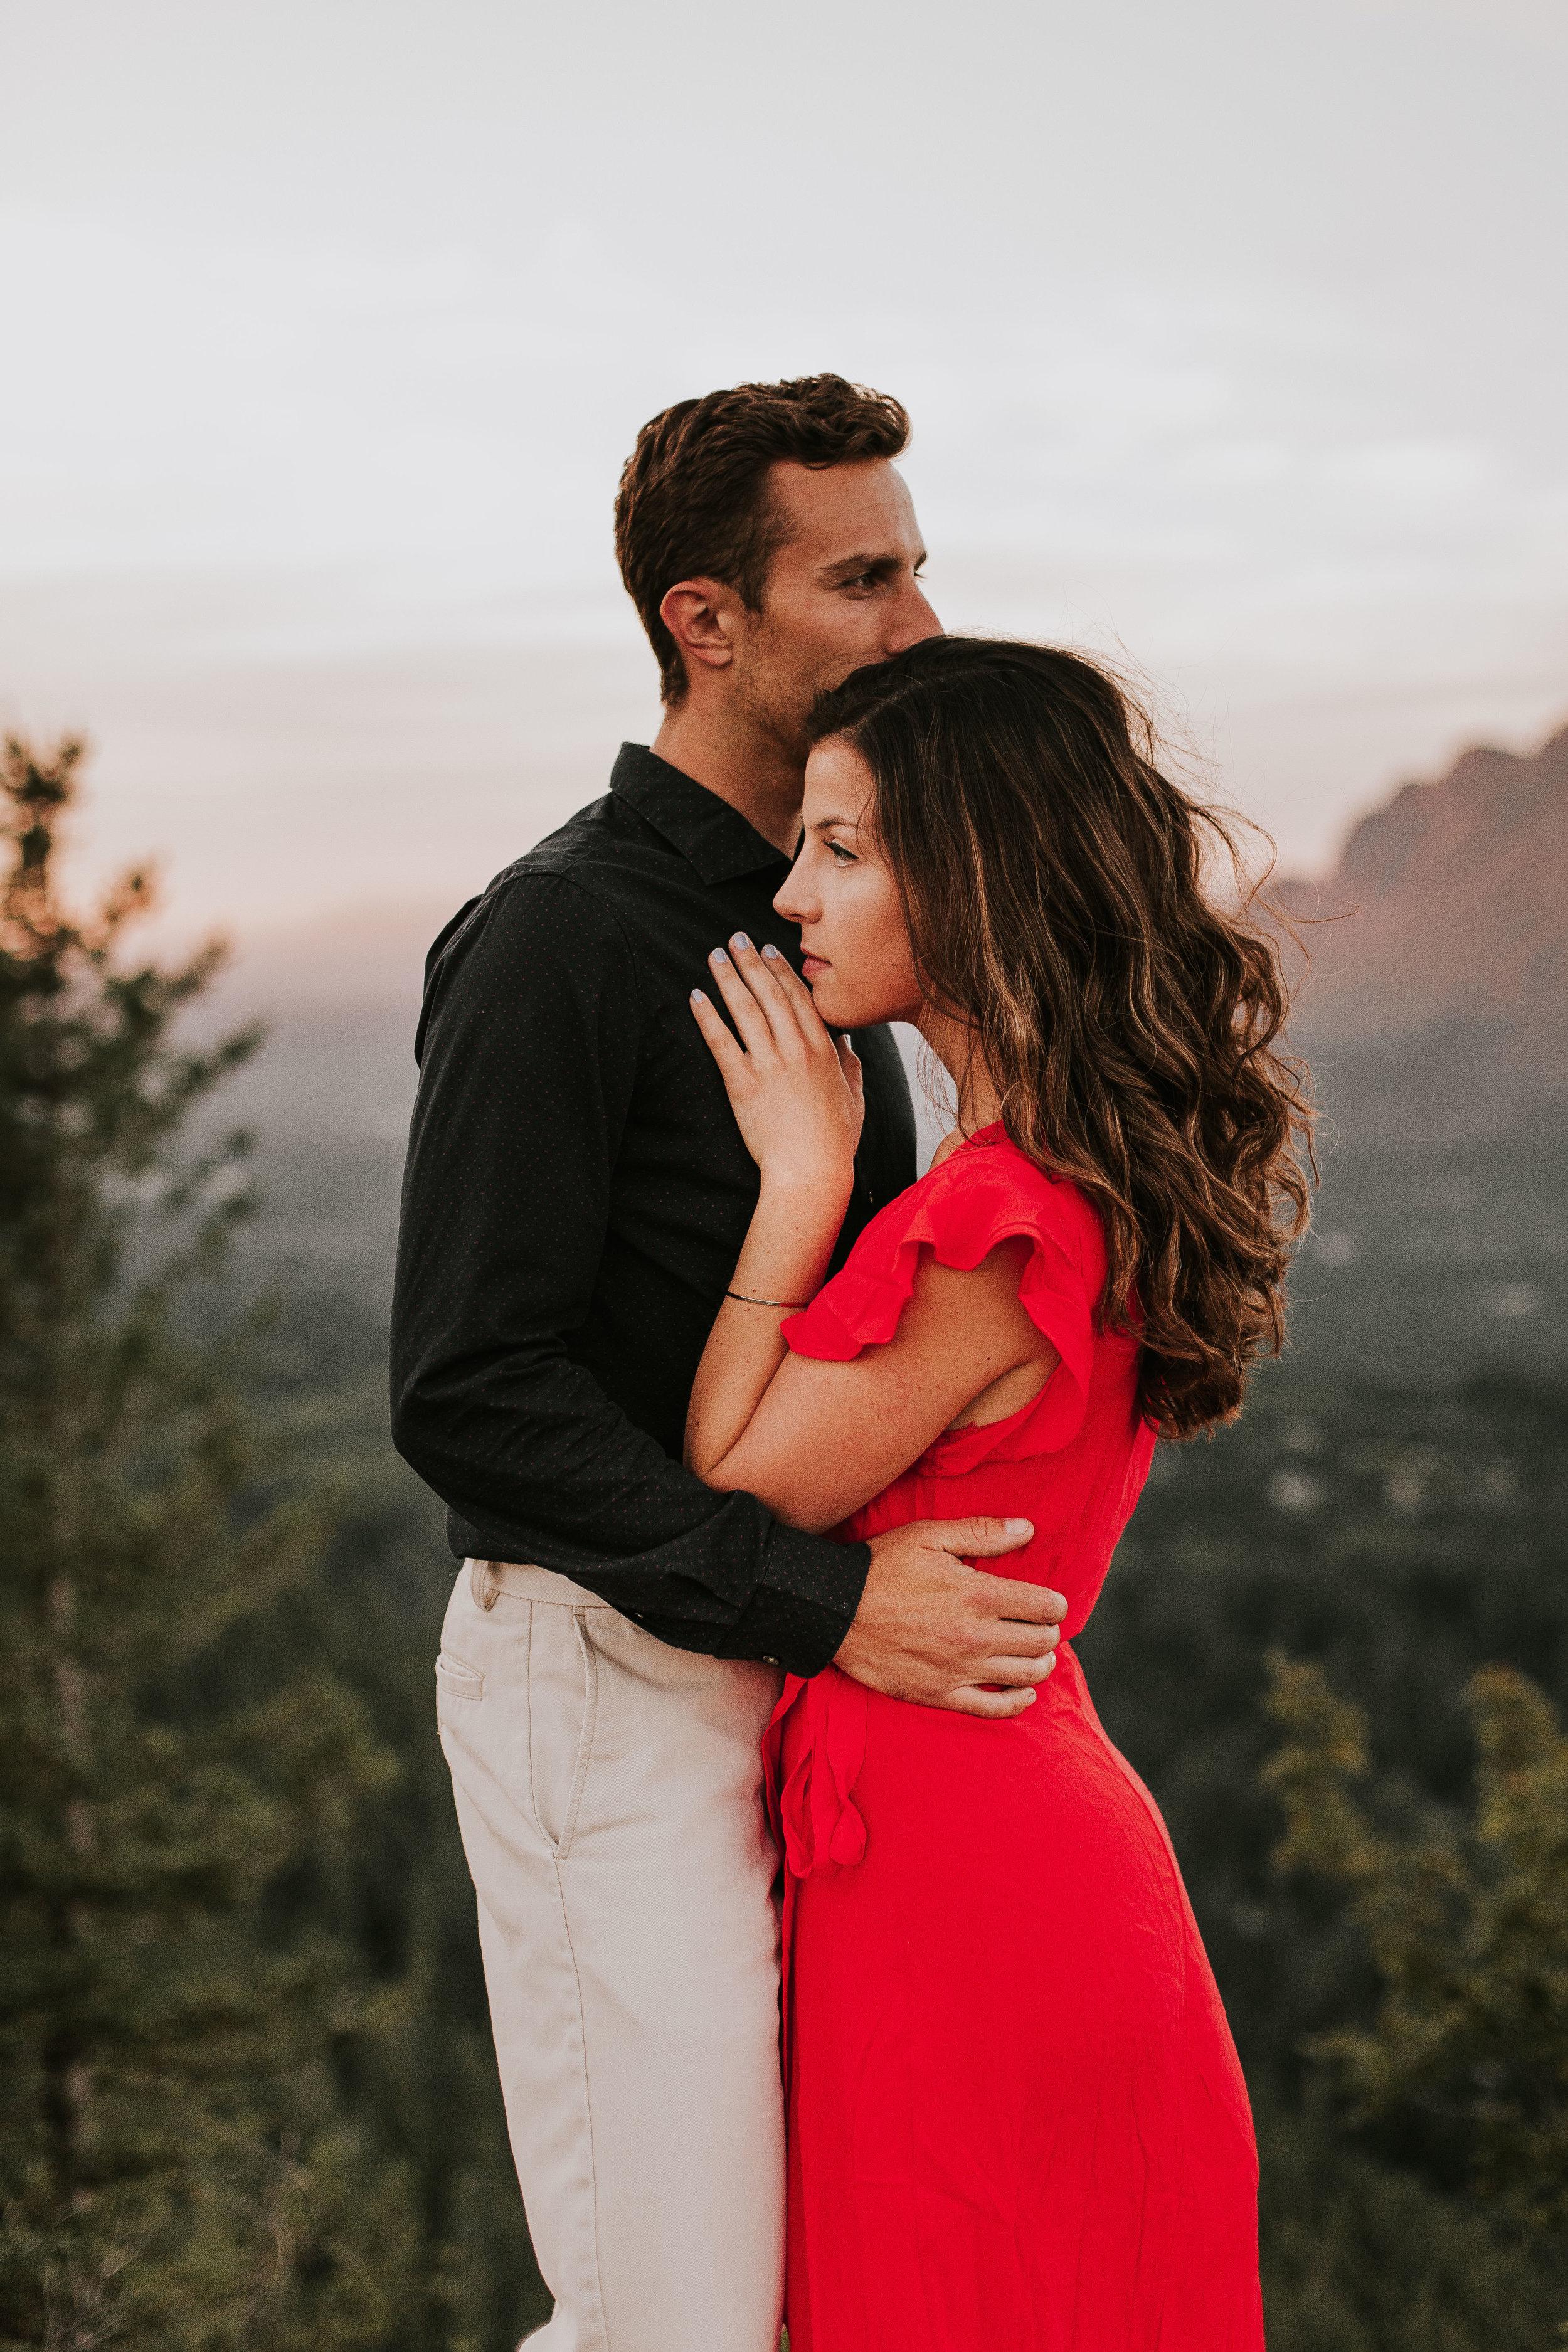 nicole-daacke-photography-rattlesnake-ridge-adventurous-engagement-session-hiking-seattle-washington-destinatino-elopement-intimate-wedding-photographer-15.jpg